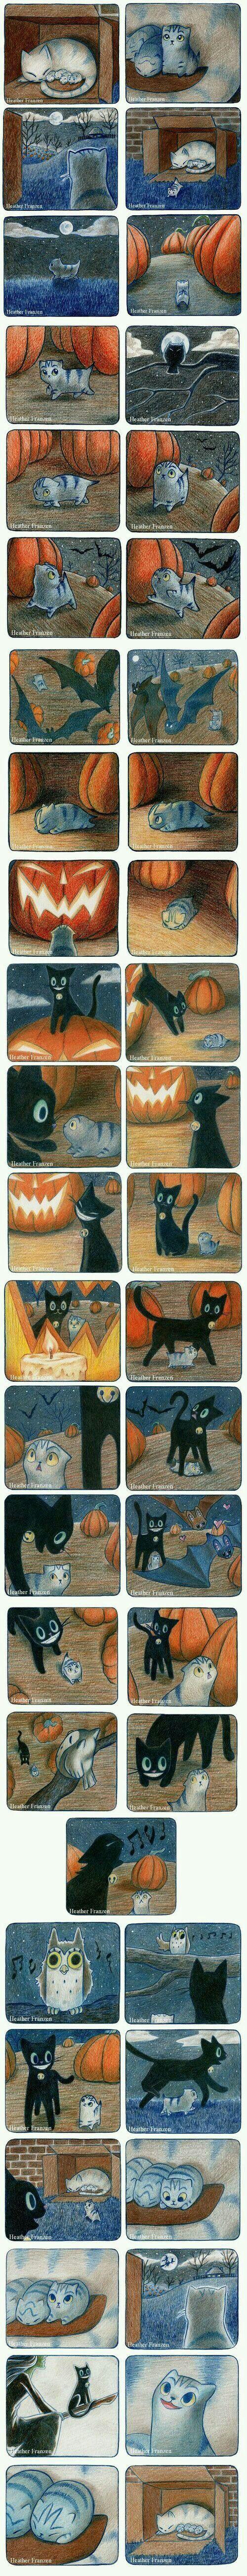 Scaredy Cat by Heather Franzen